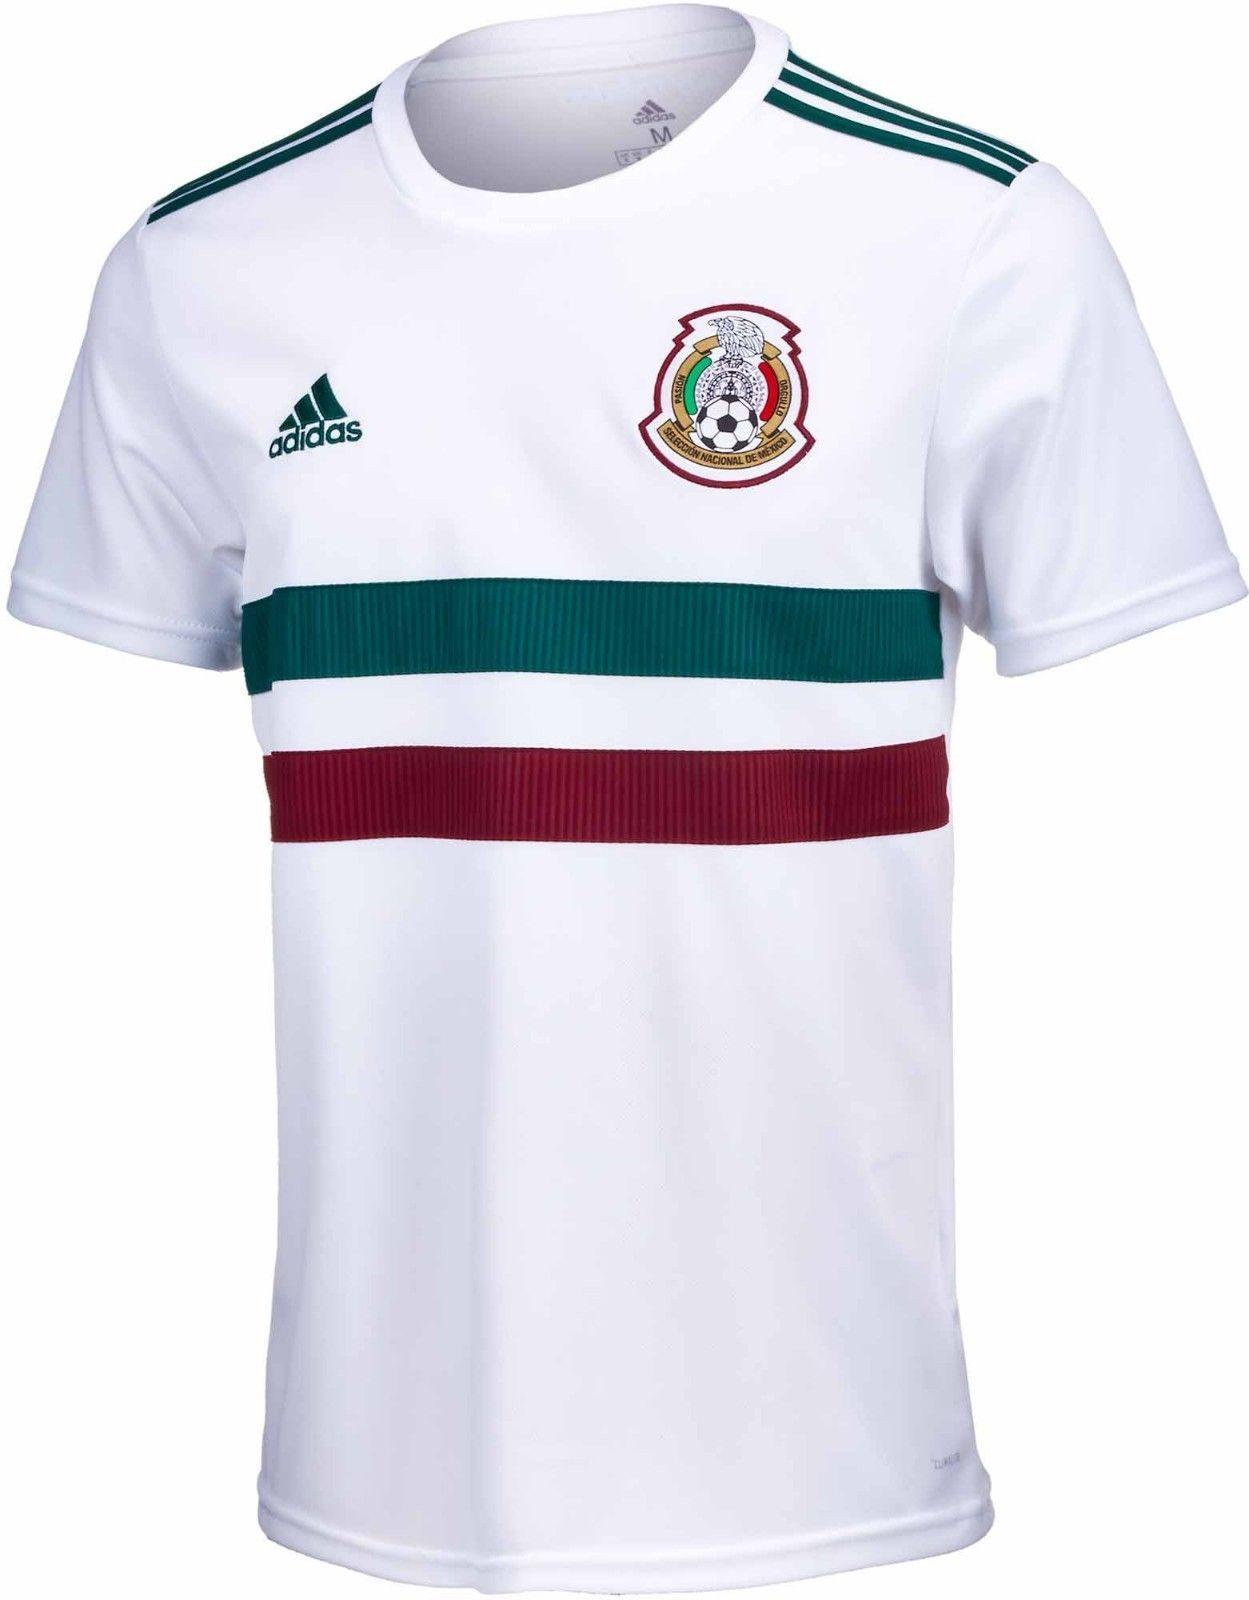 07ab0b353 adidas Men s Mexico 18 19 Away Jersey White Green BQ4689 (eBay Link ...